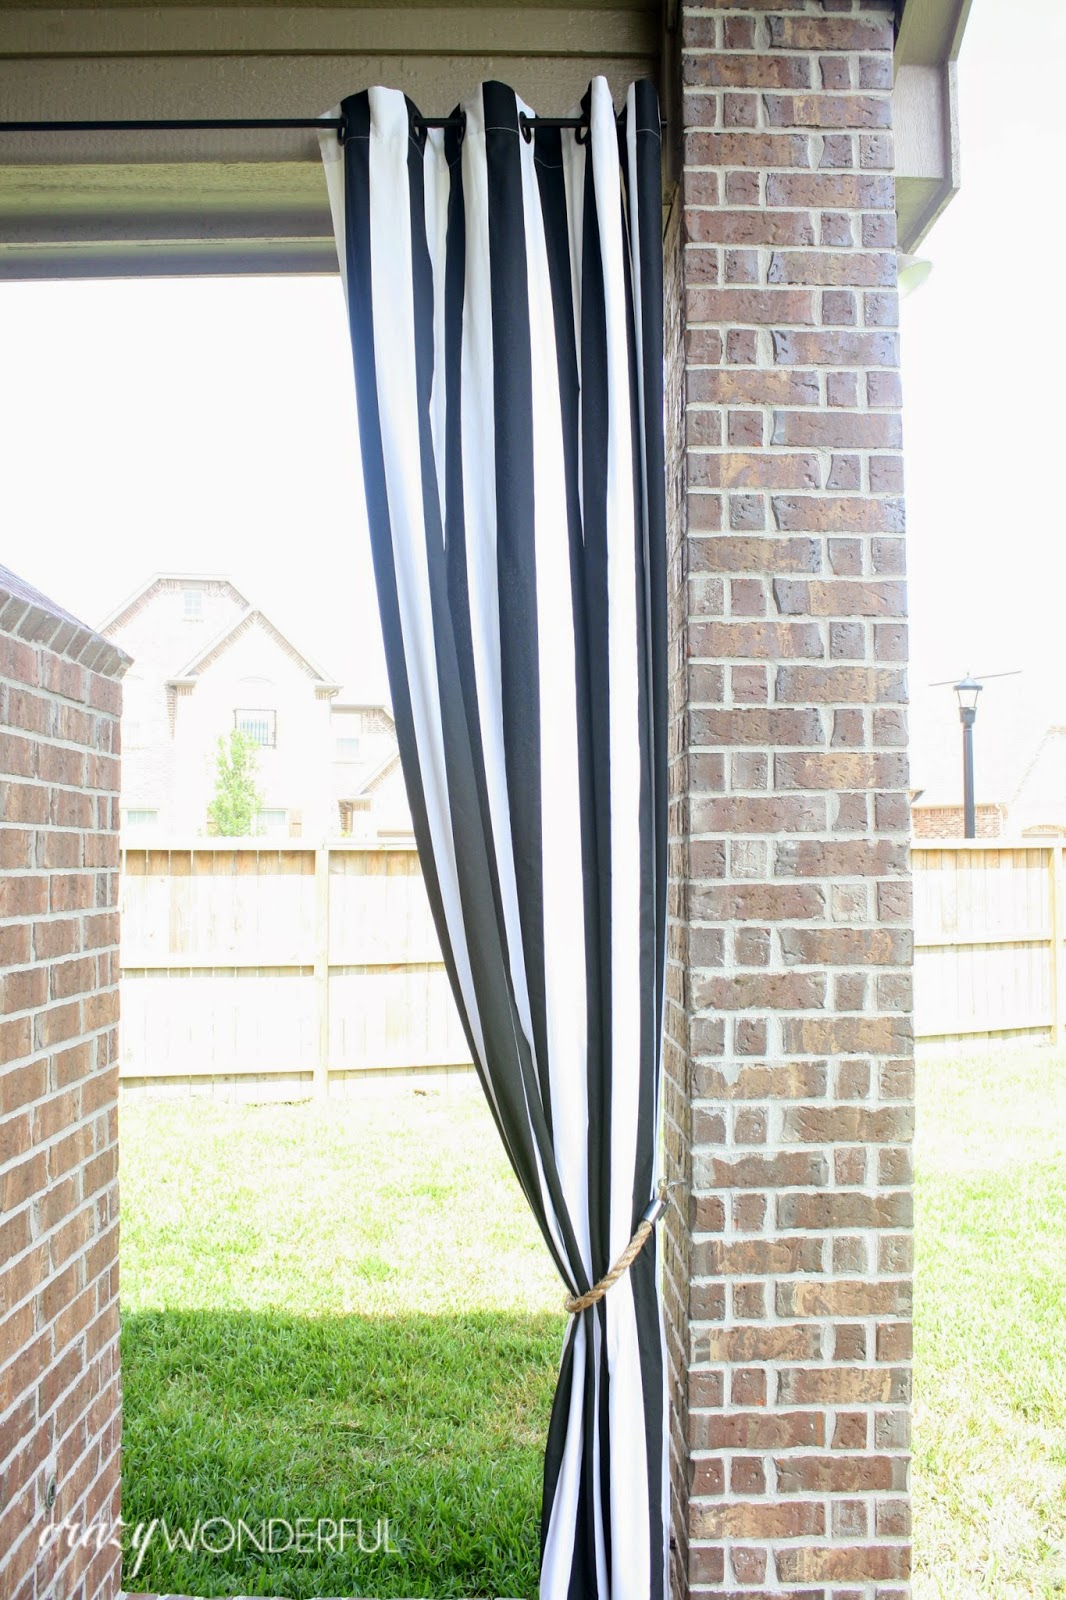 Patio Curtains Diy Rope Tieback Crazy Wonderful